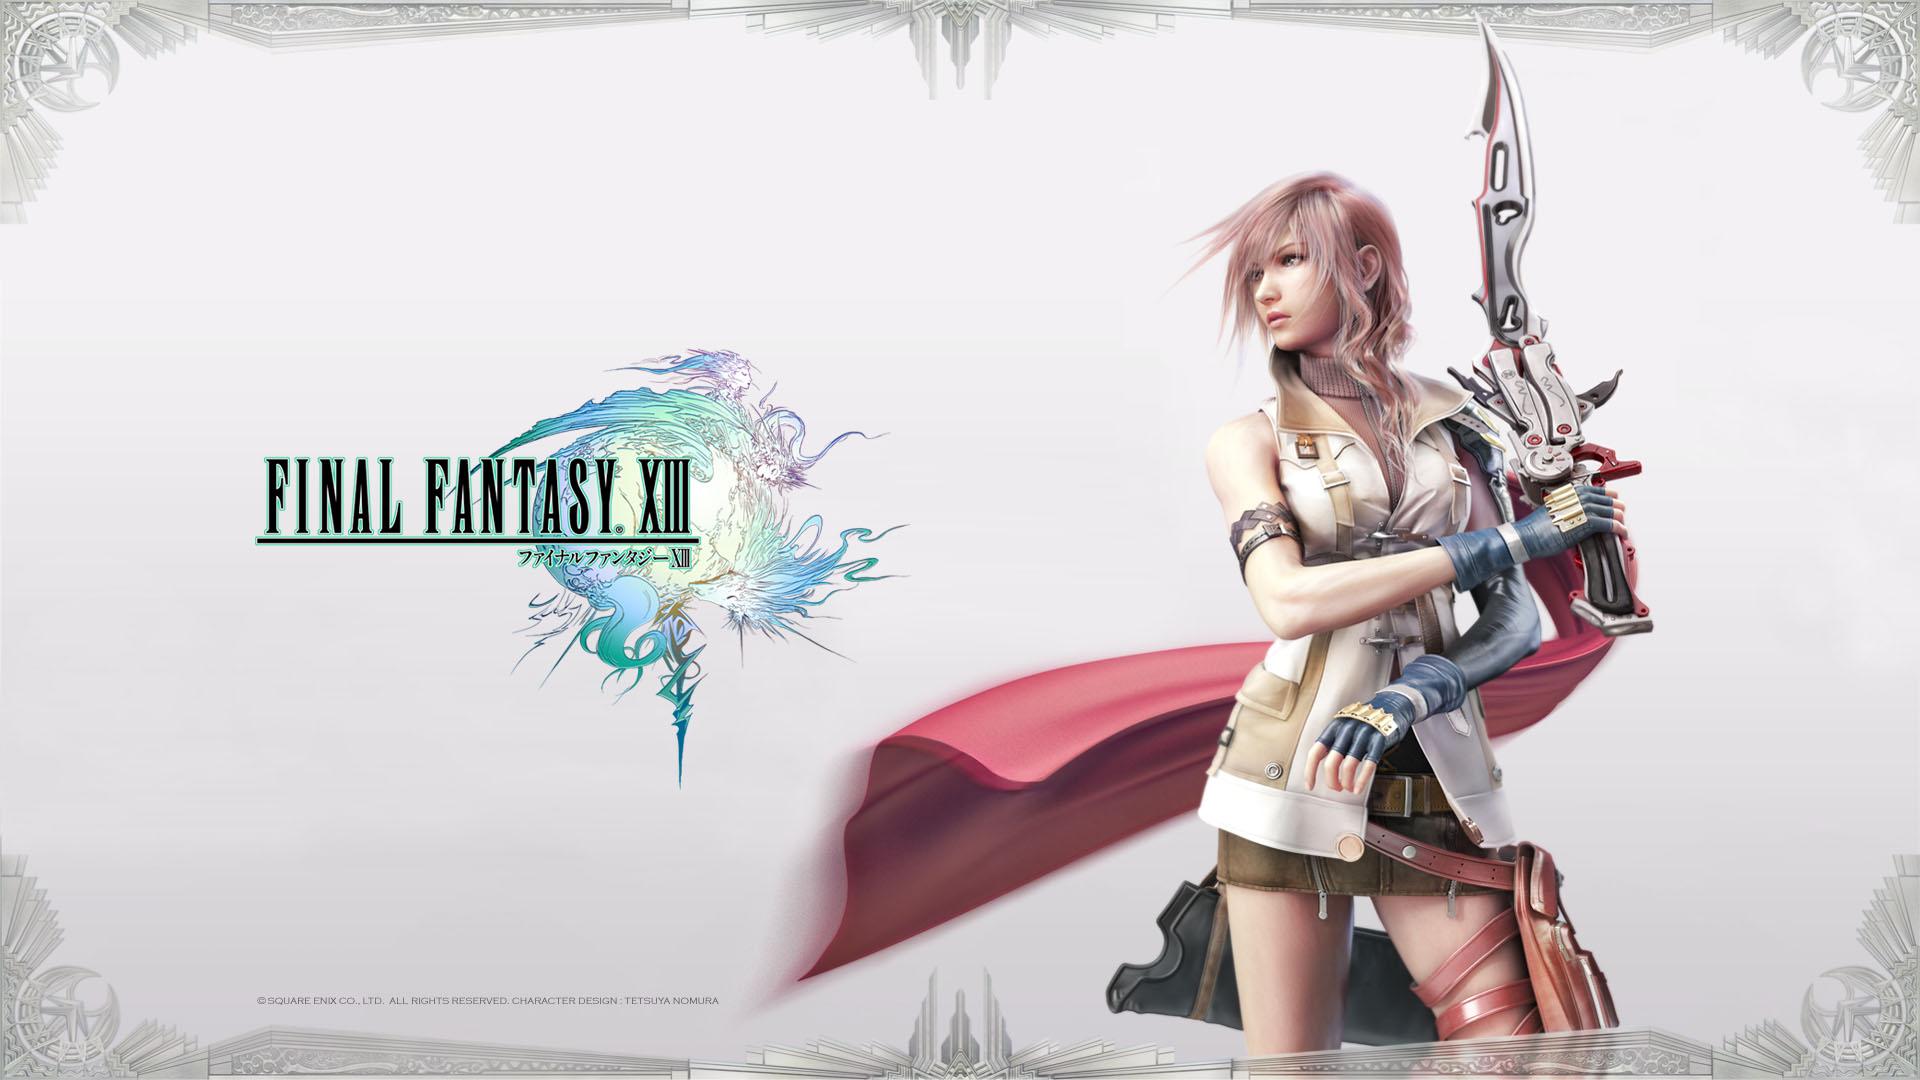 Desktop Wallpaper Final Fantasy Xiii #h354969 | Games HD Images